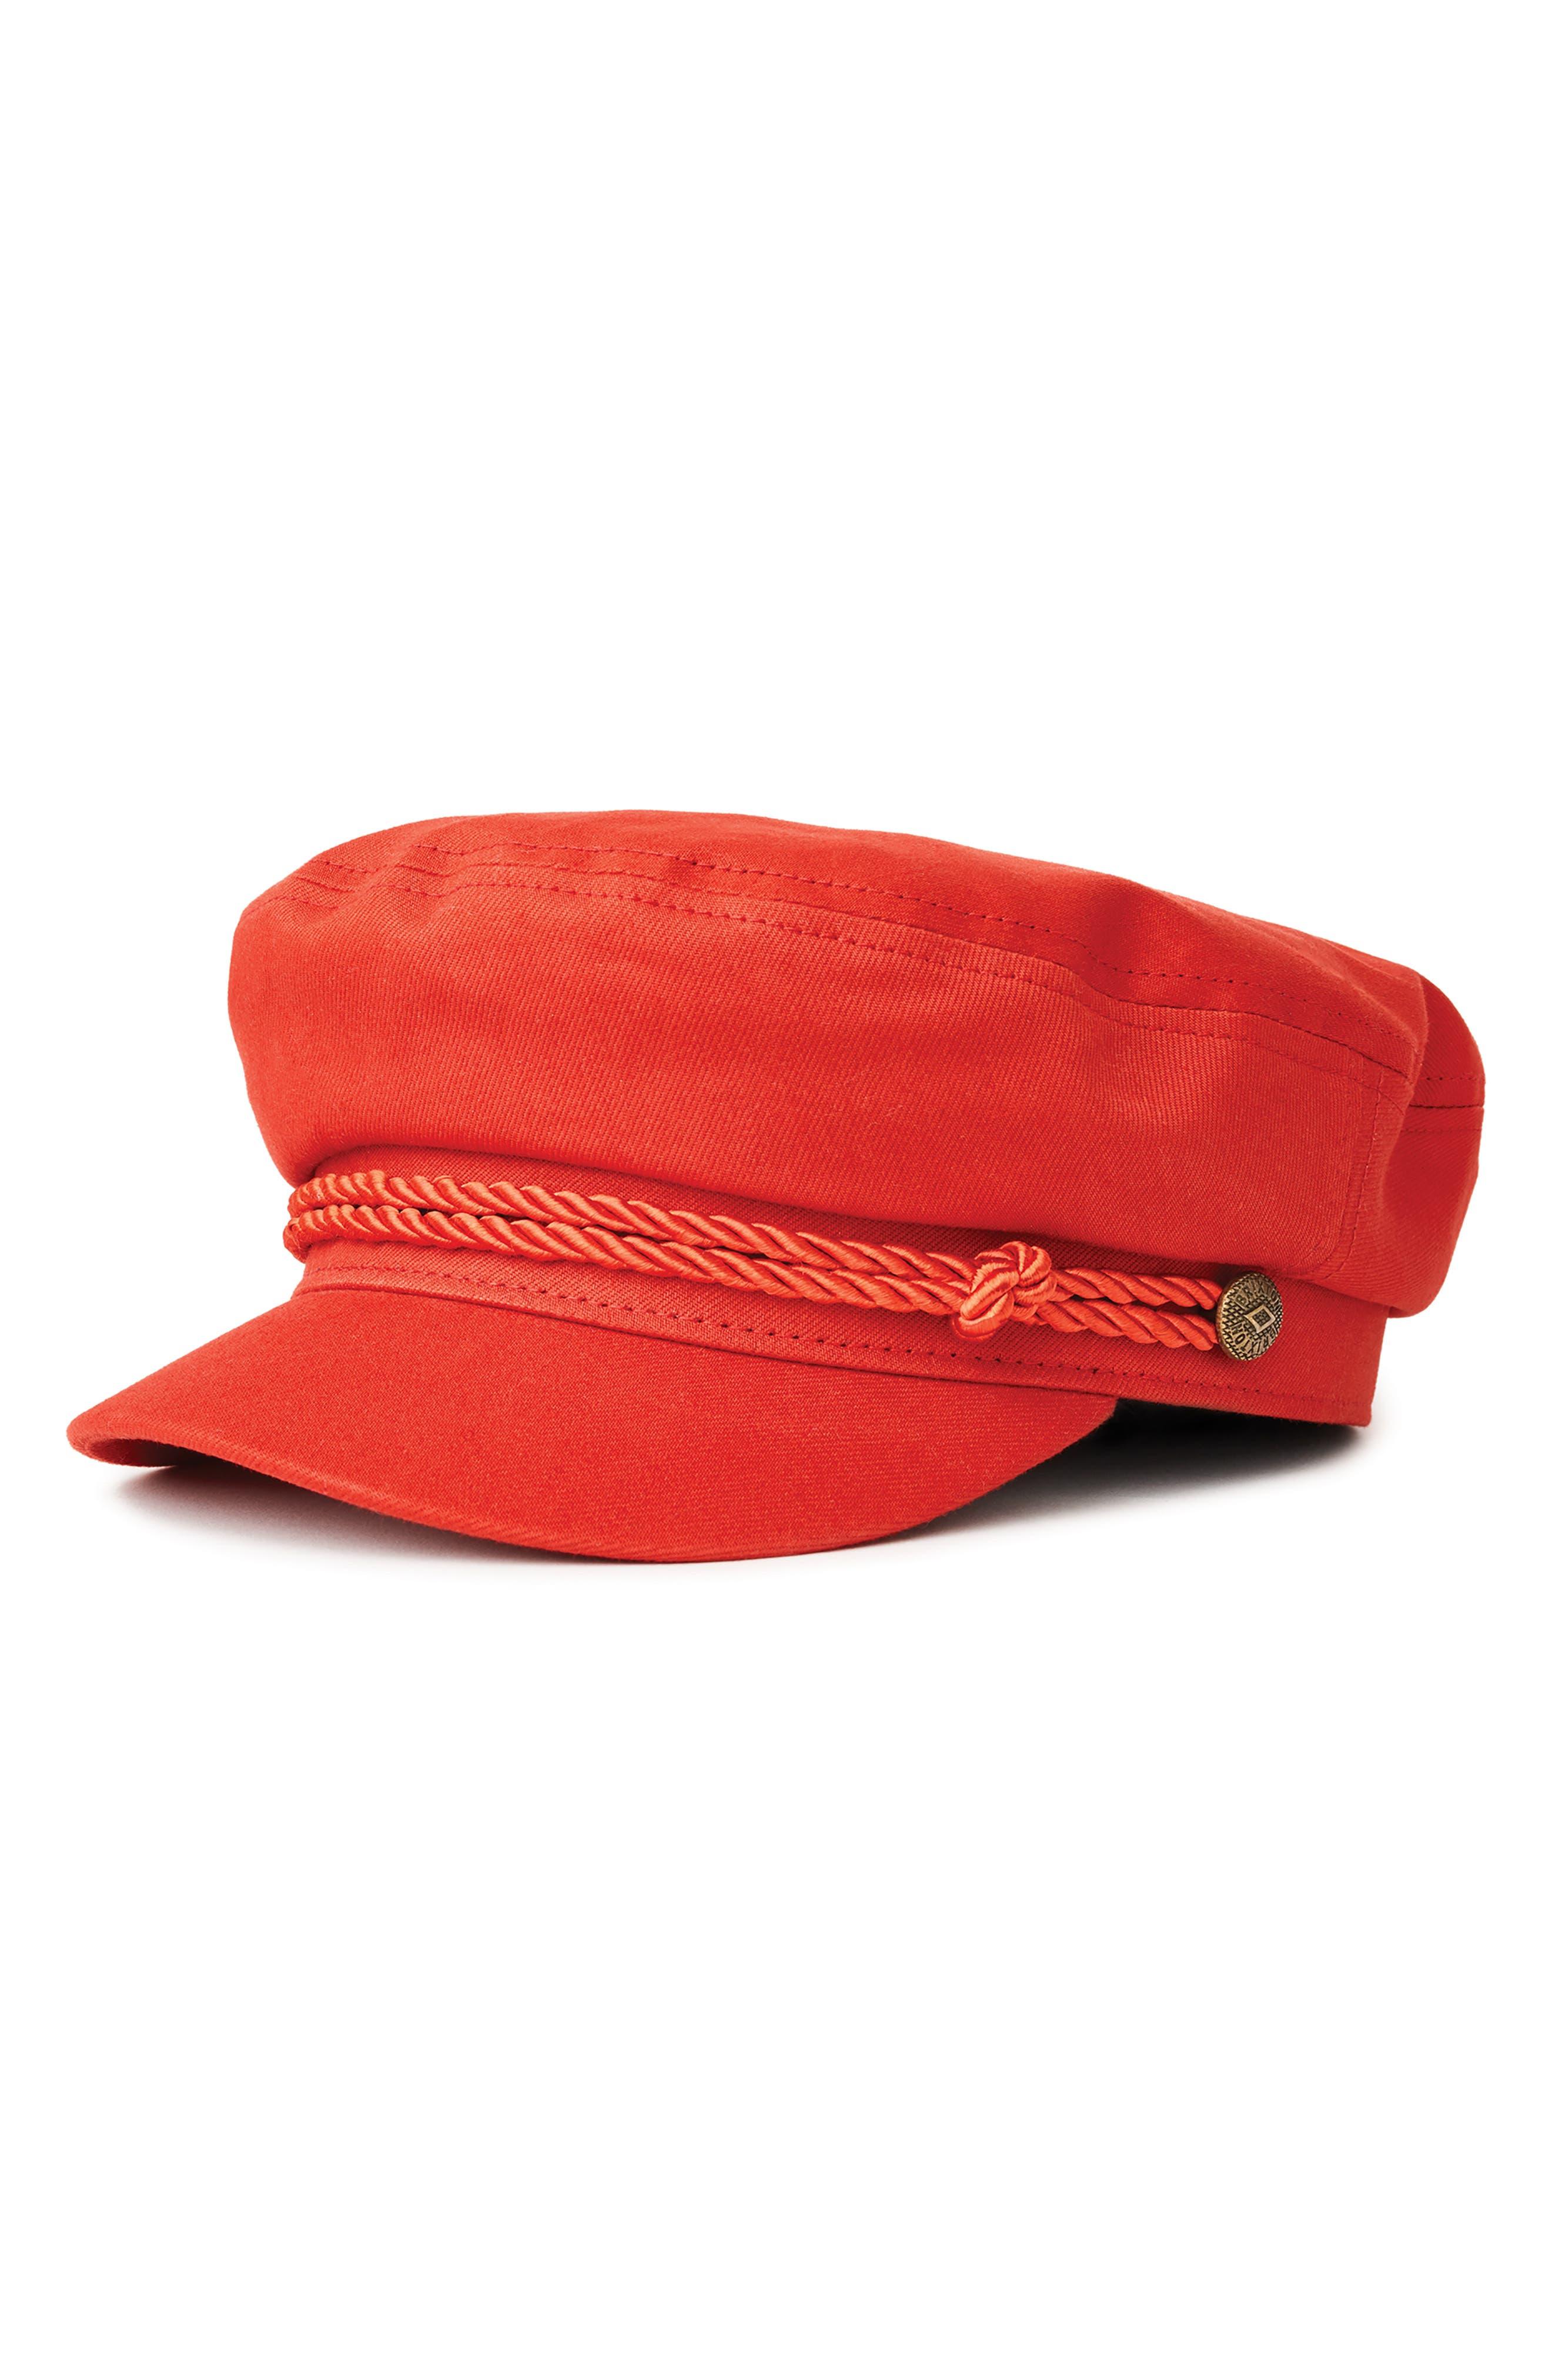 Fiddler Cap,                         Main,                         color, RED/ RED